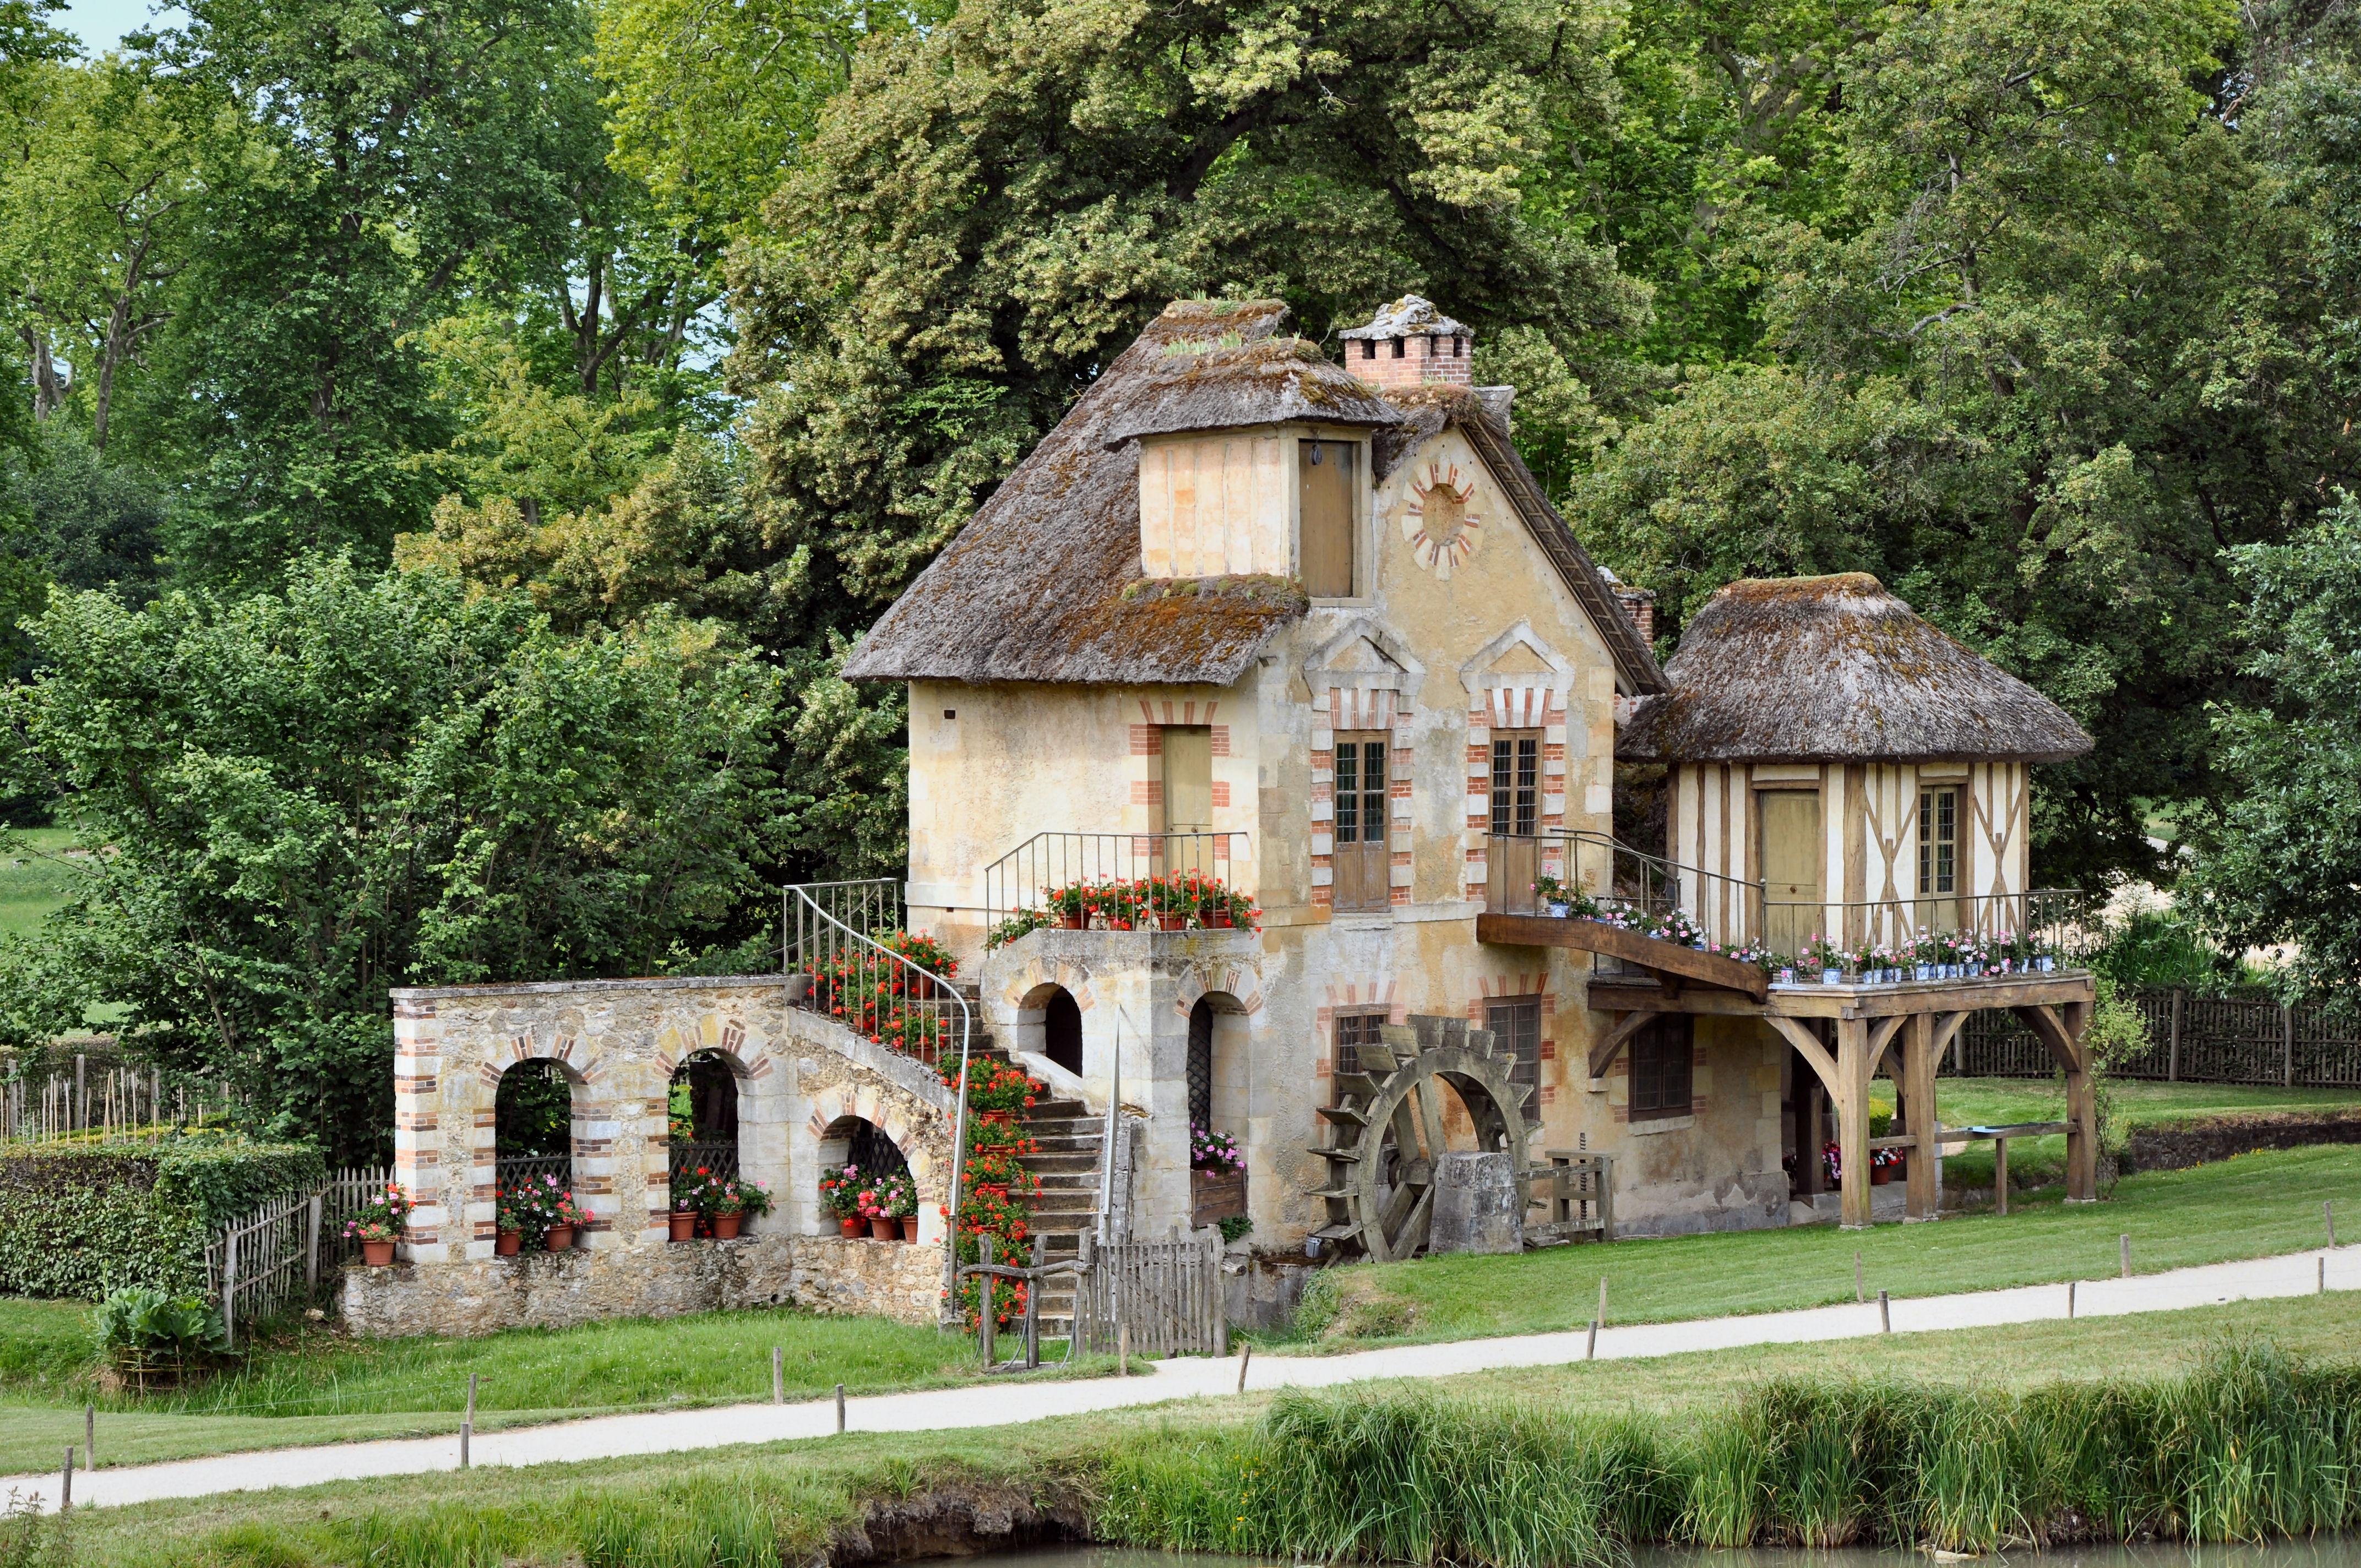 file moulin au hameau de la reine 2 jpg wikimedia commons. Black Bedroom Furniture Sets. Home Design Ideas